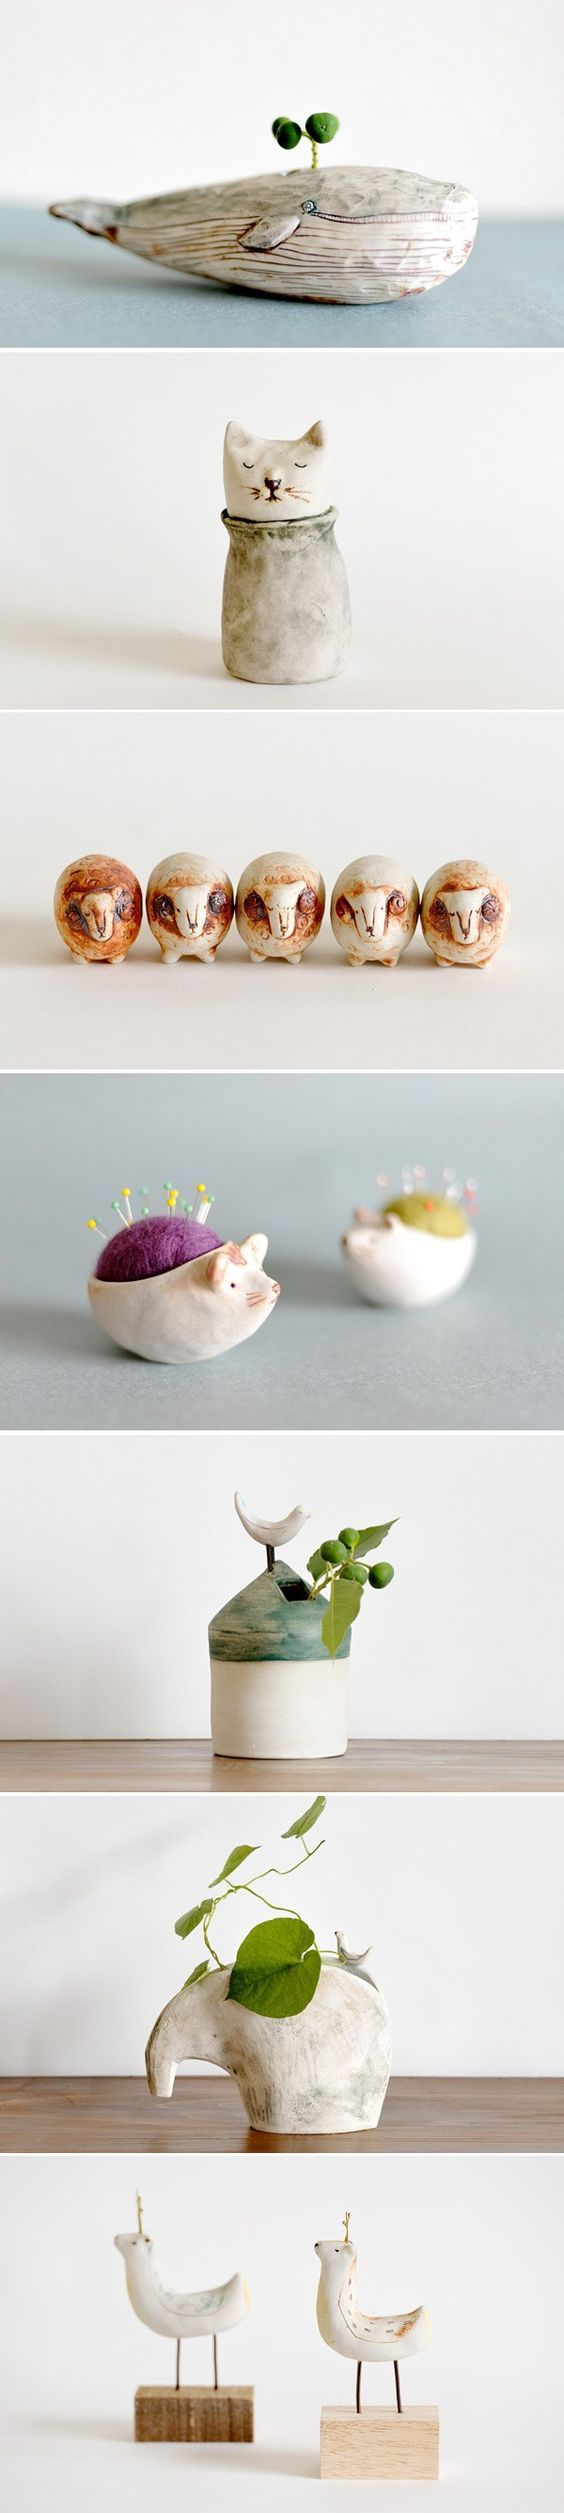 best ceramica images on Pinterest Ceramic pottery Pottery